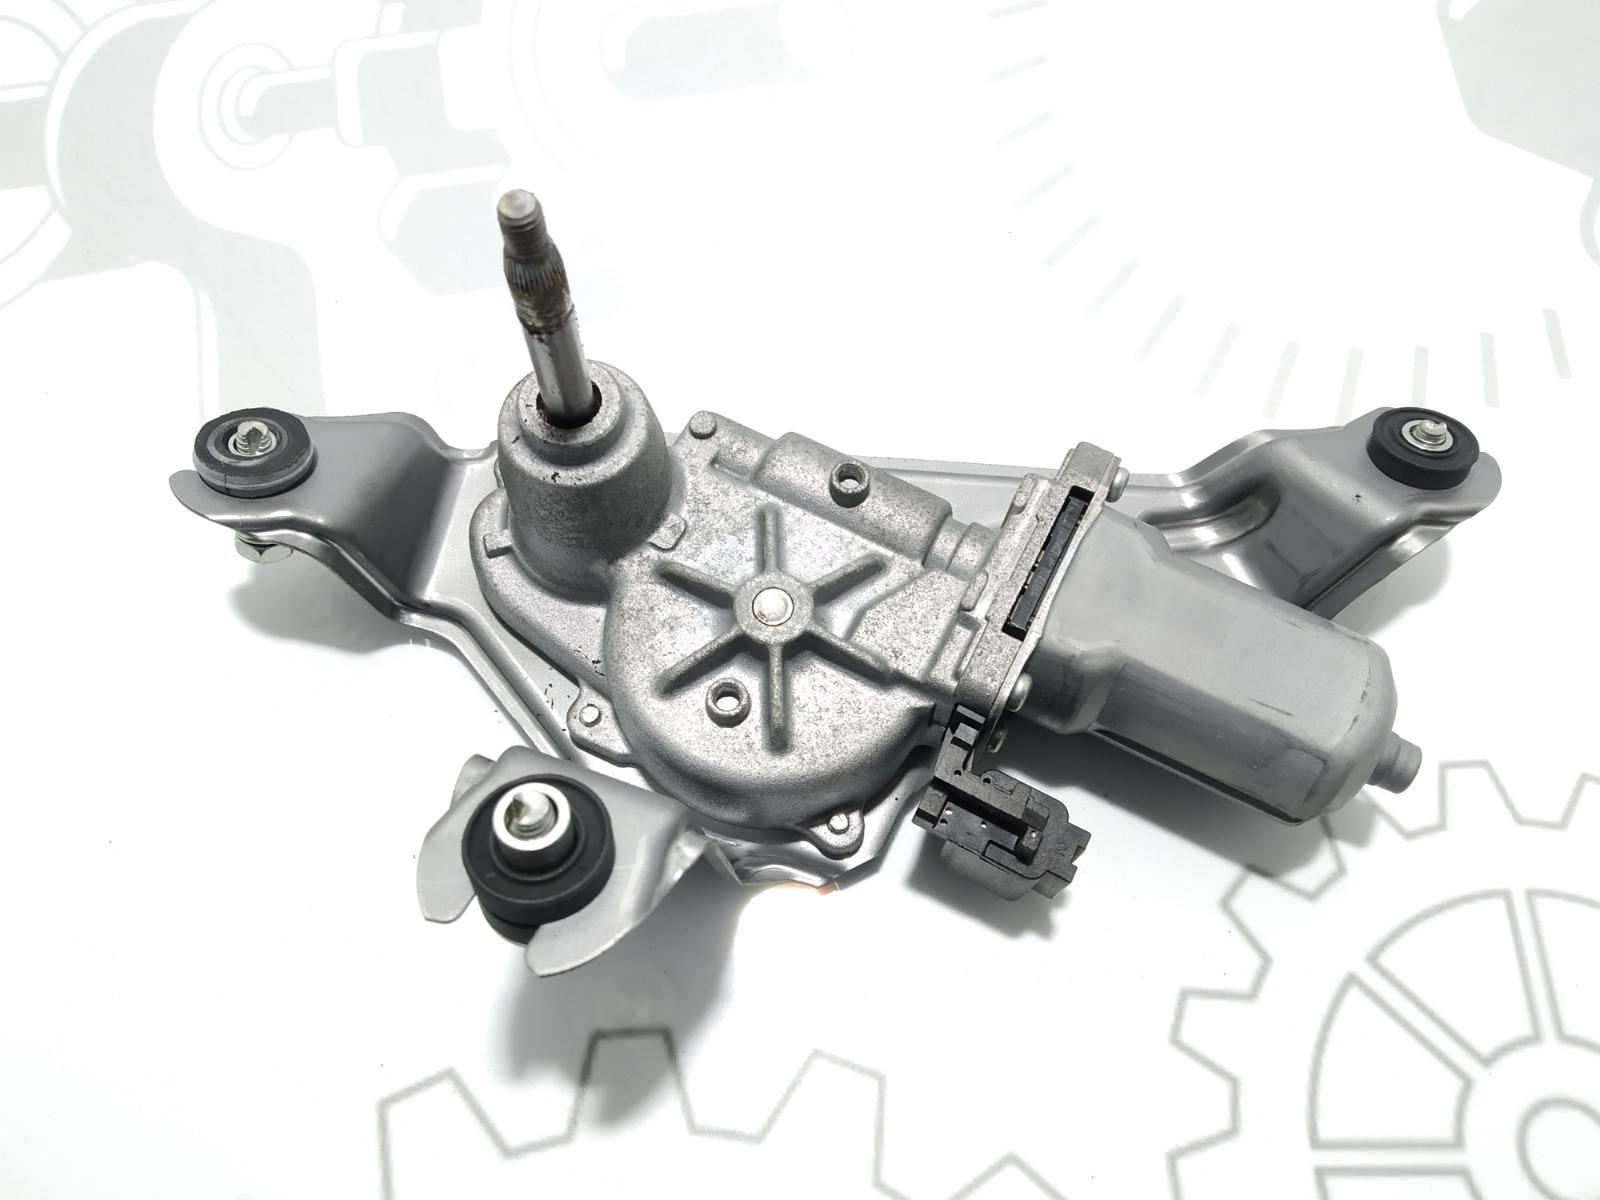 Моторчик заднего стеклоочистителя (дворника) Mazda 6 2.2 CDTI 2010 (б/у)